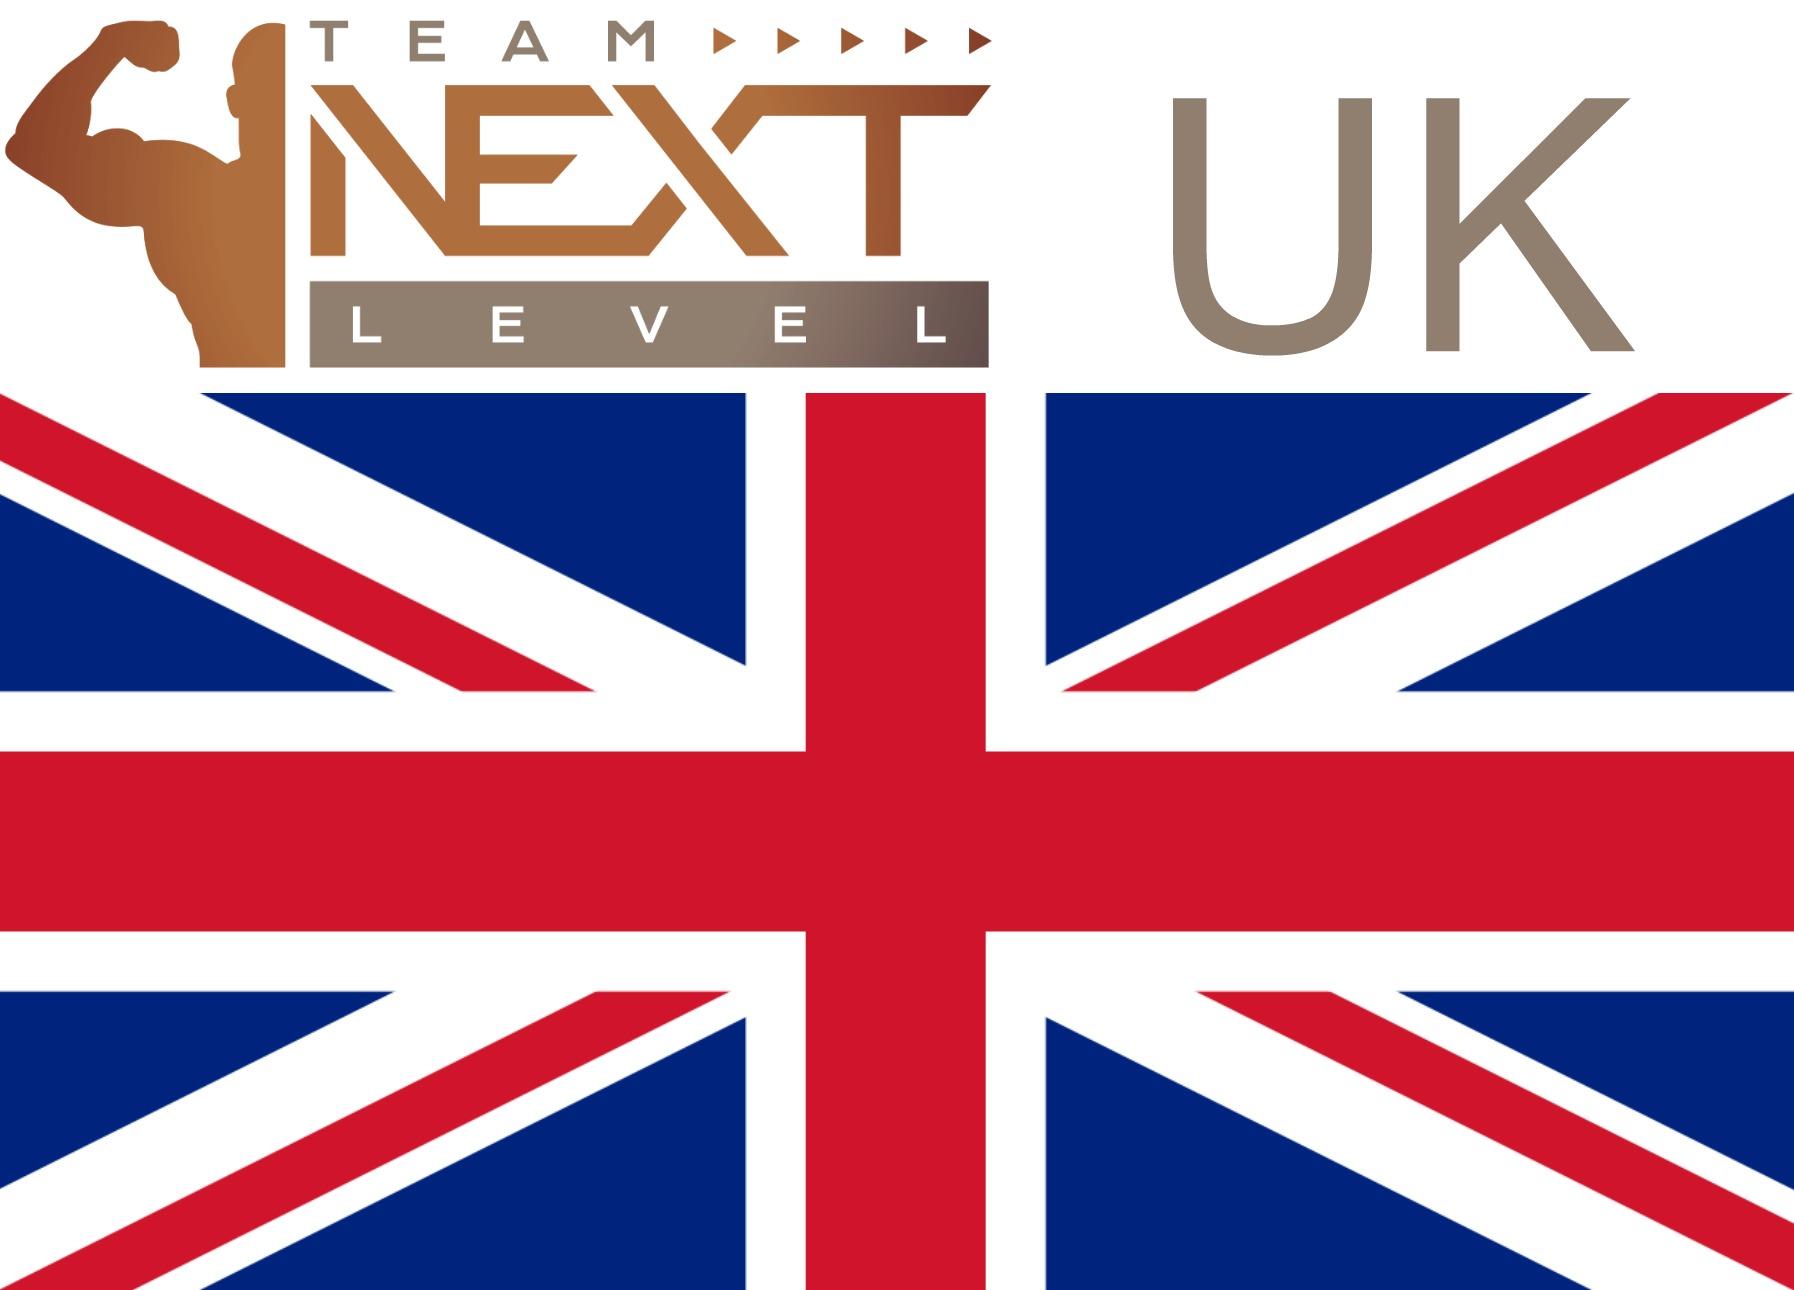 Top Beachbody Coaches coming to the UK